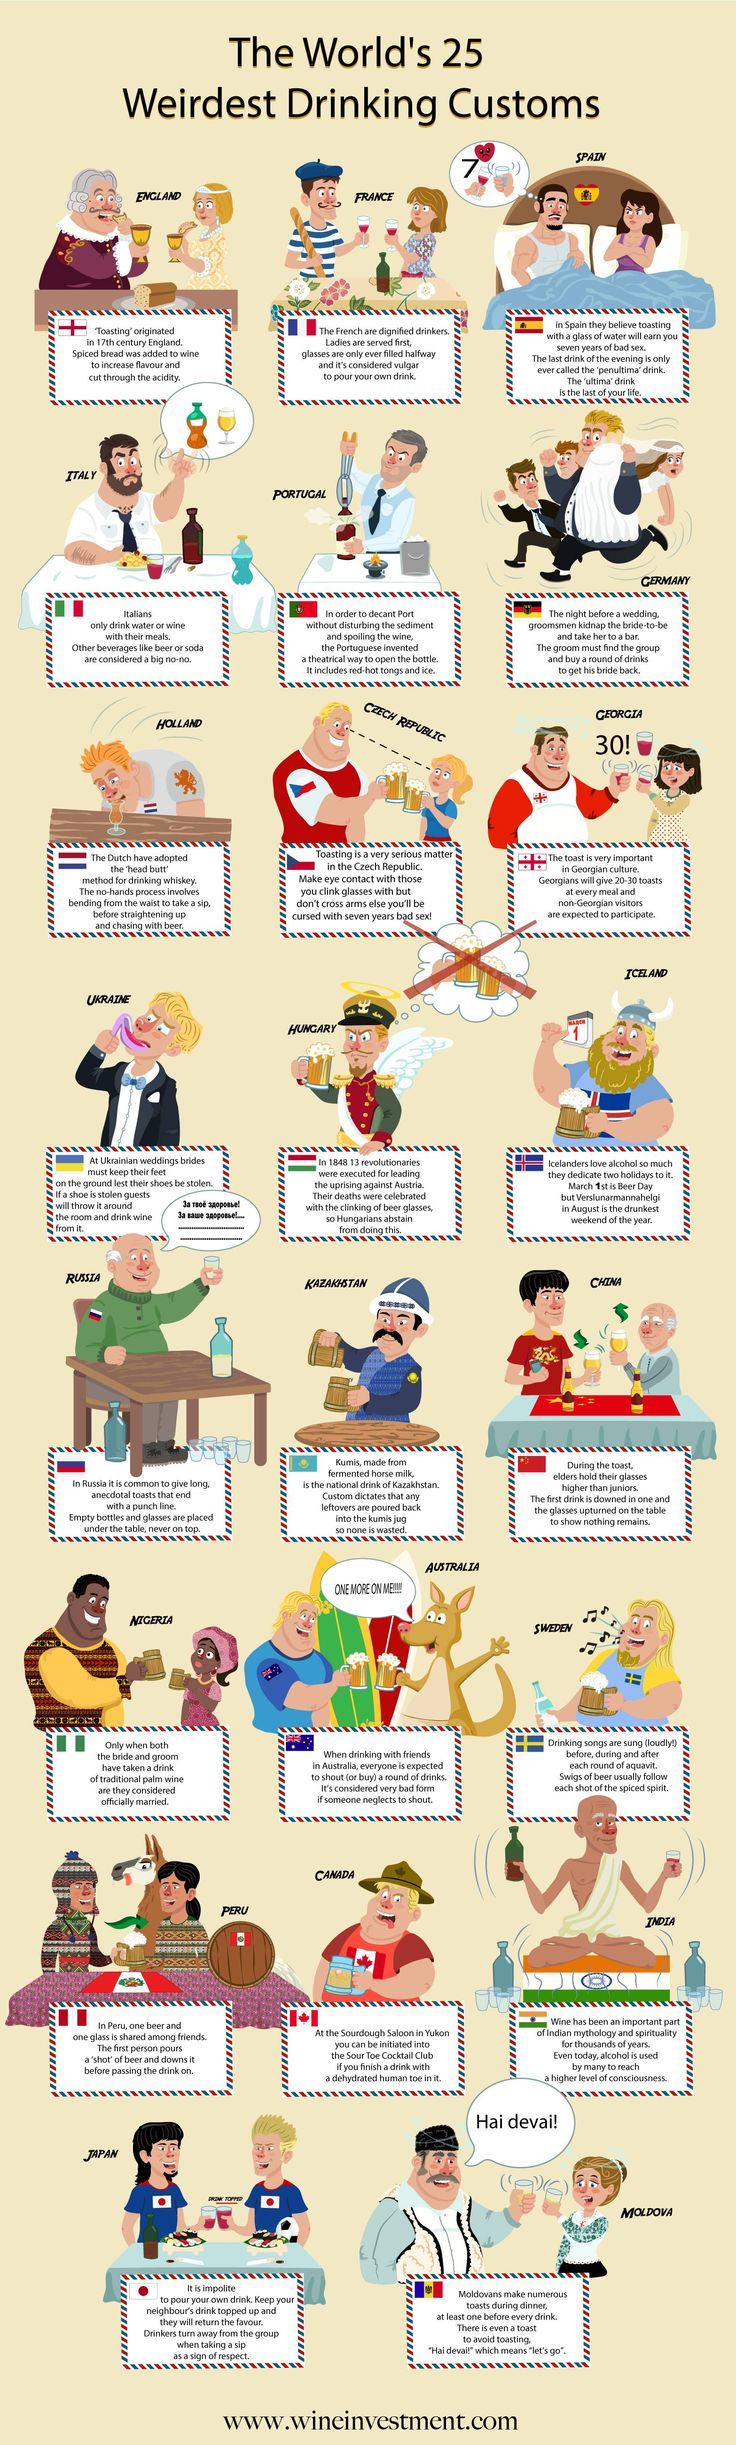 Las 25 costumbres mas raras para tomar vino del mundo #WINEUP